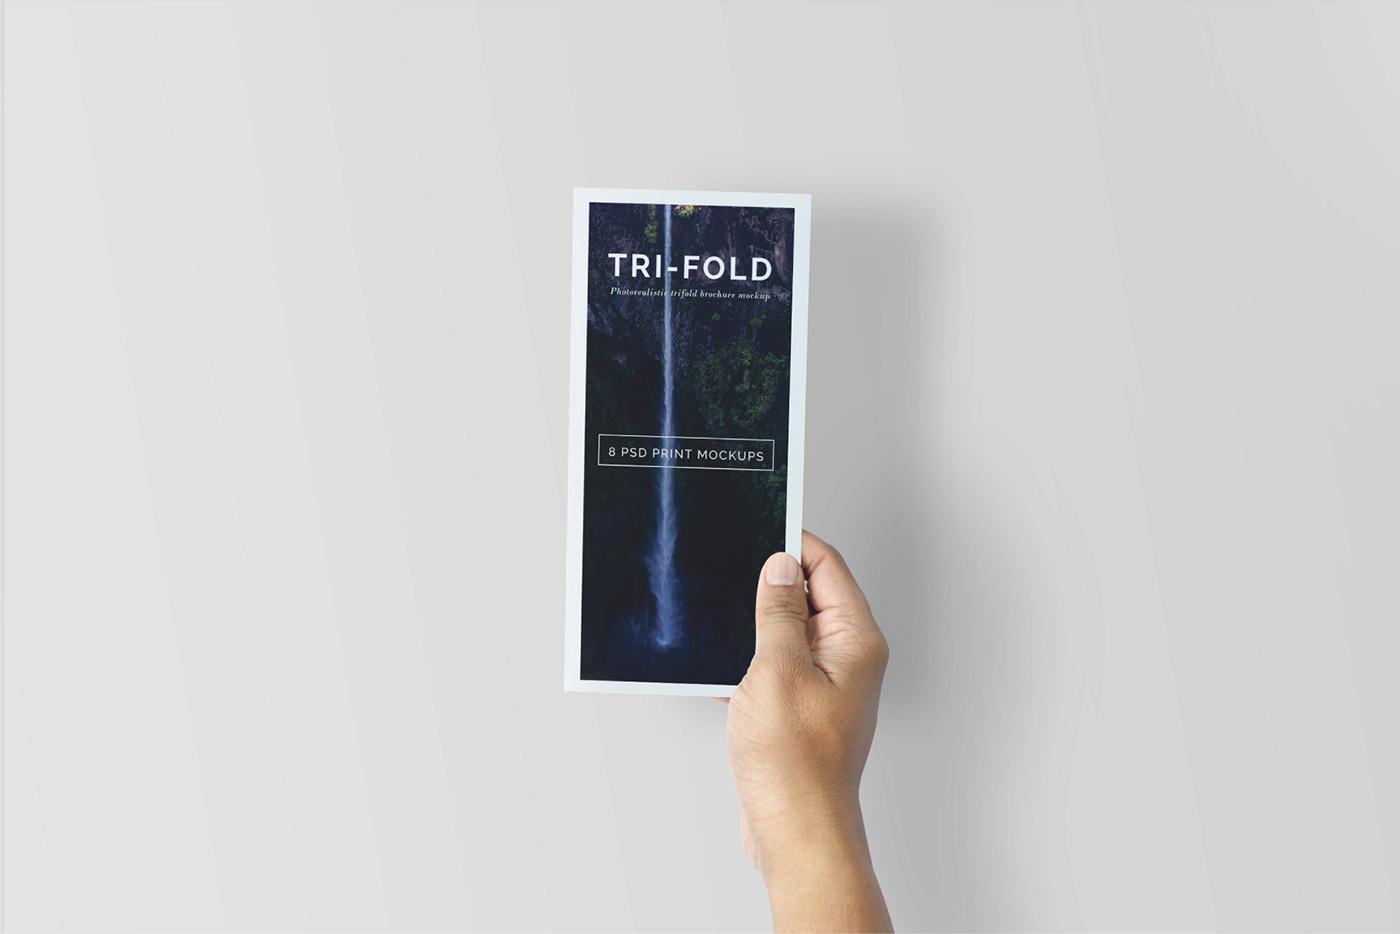 free freebie free mockup  mockup freebie card mockup brochure mockup free design Display Photography  brand